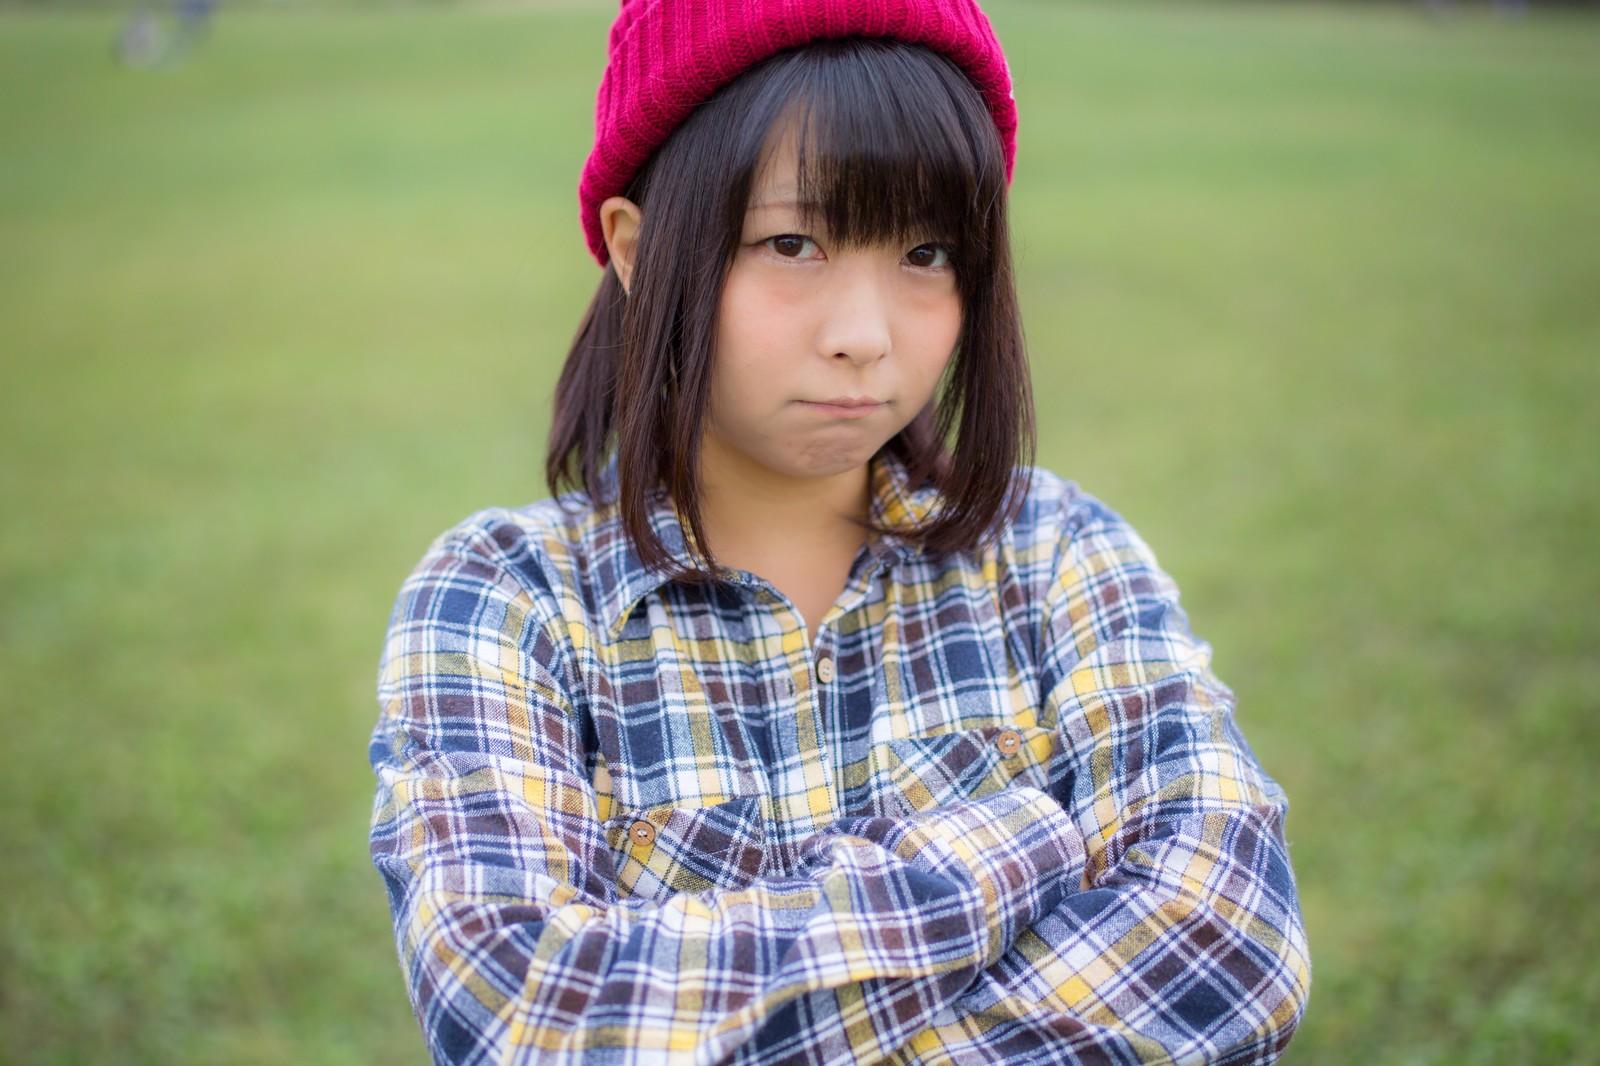 tsuru_syouganaina-_TP_V.jpg